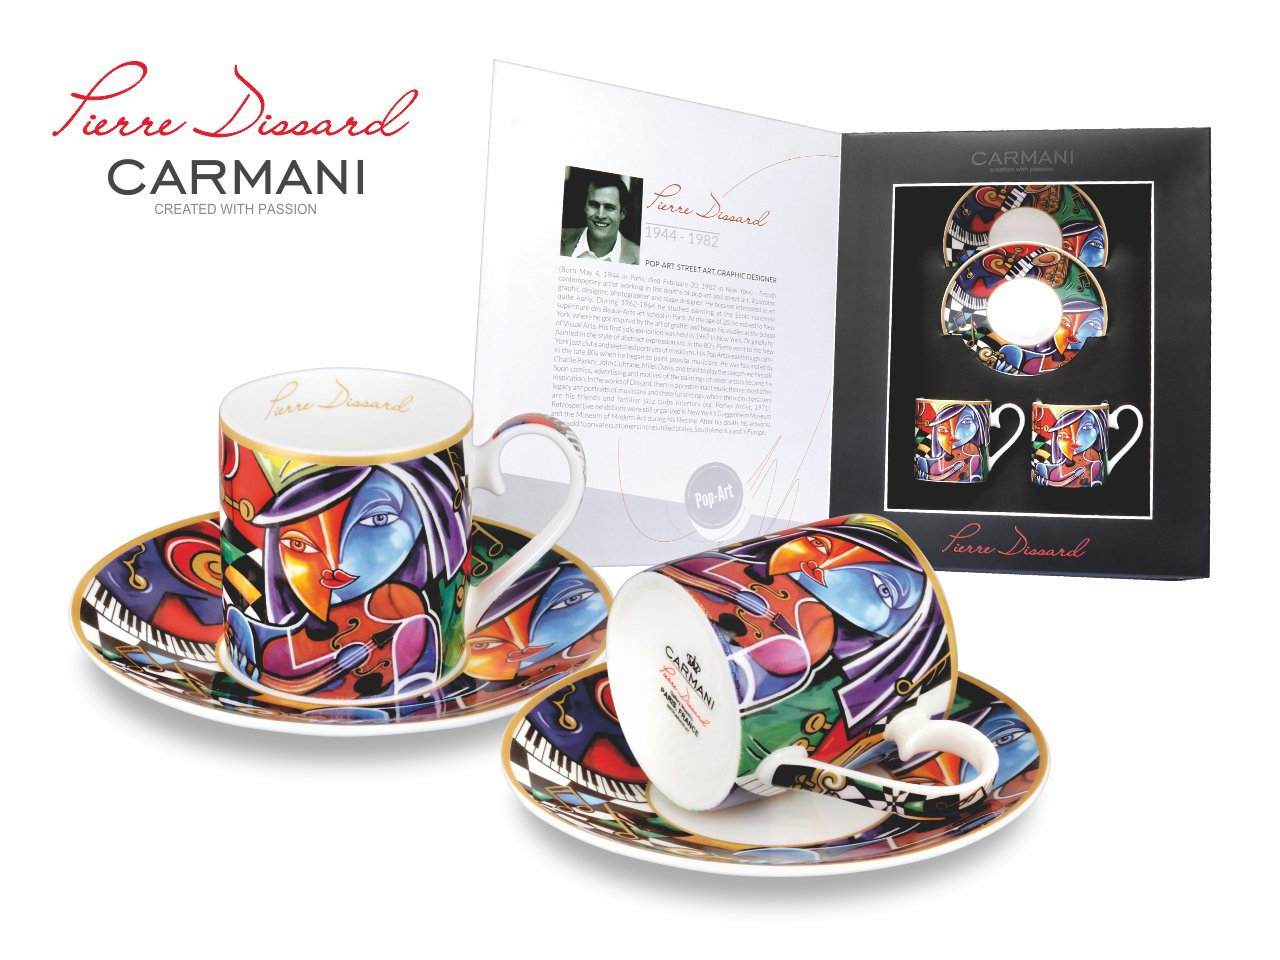 Carmani Painters 4-pc Espresso Coffee Set, Pierre Dissard Porcelain Series (Virtuoso)